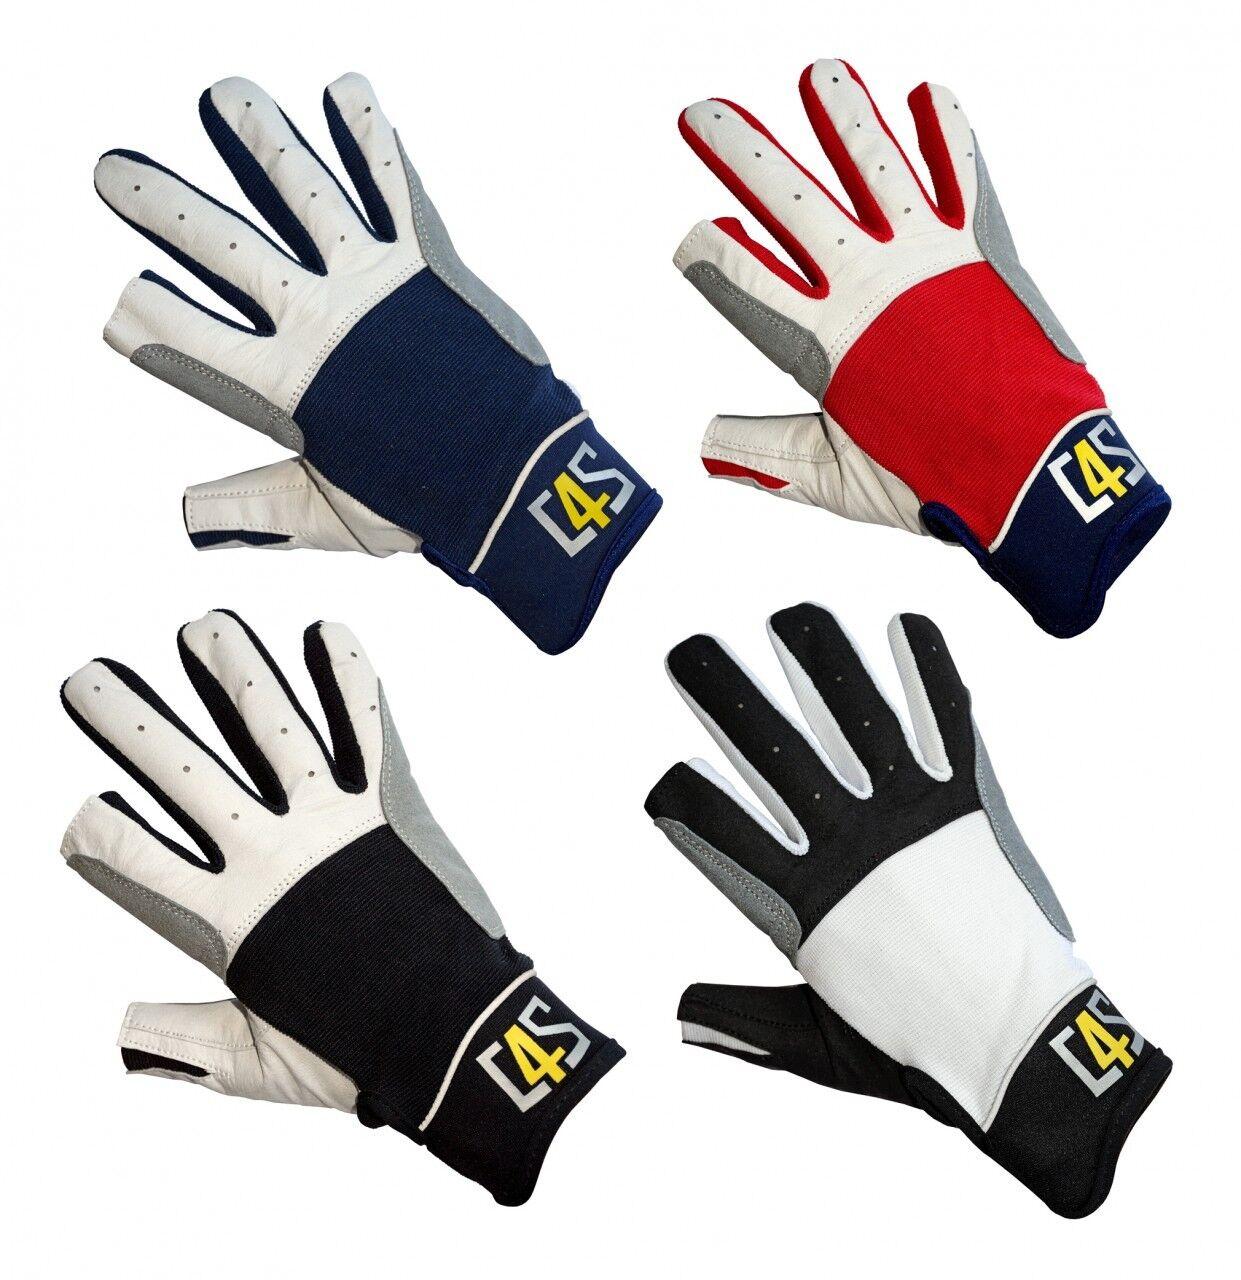 crazy4sailing C4S Segelhandschuhe Cruising - 2 Finger frei - Handschuhe Segeln